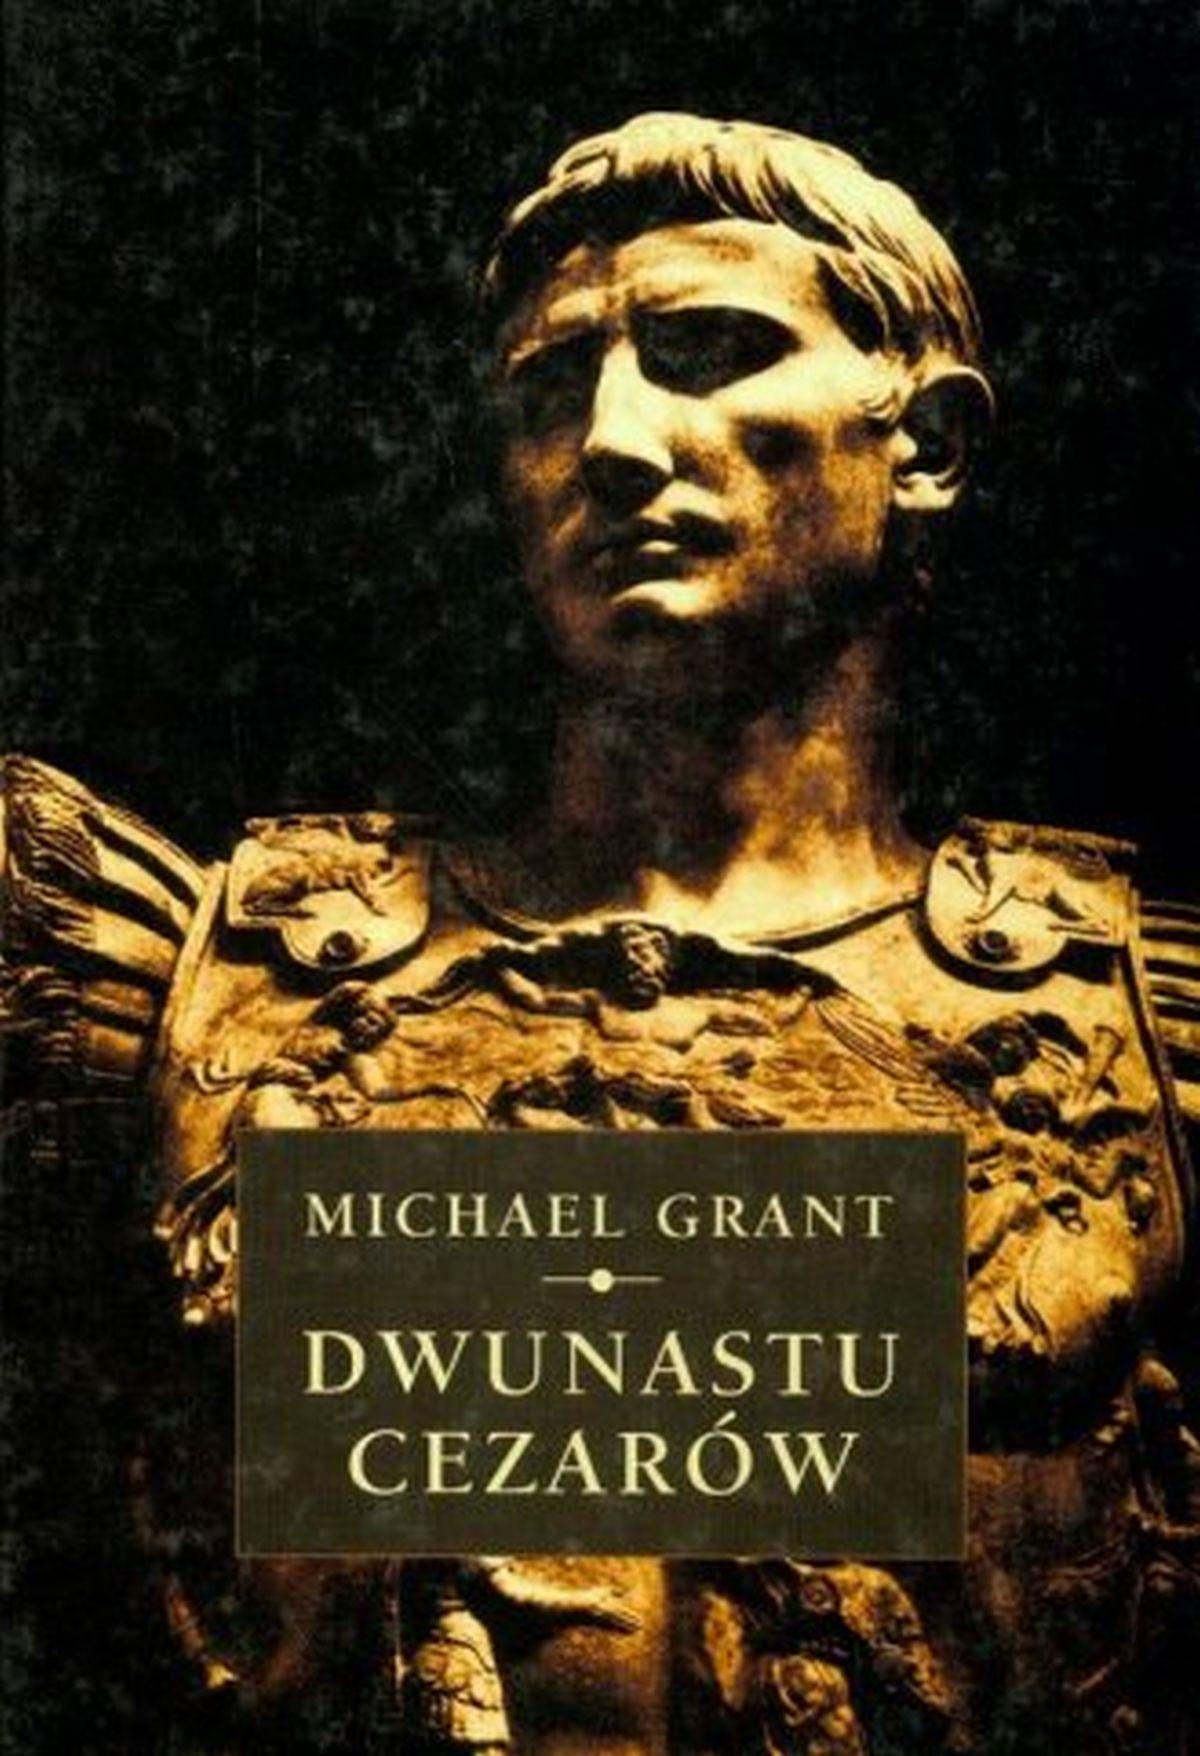 Dwunastu Cezarów